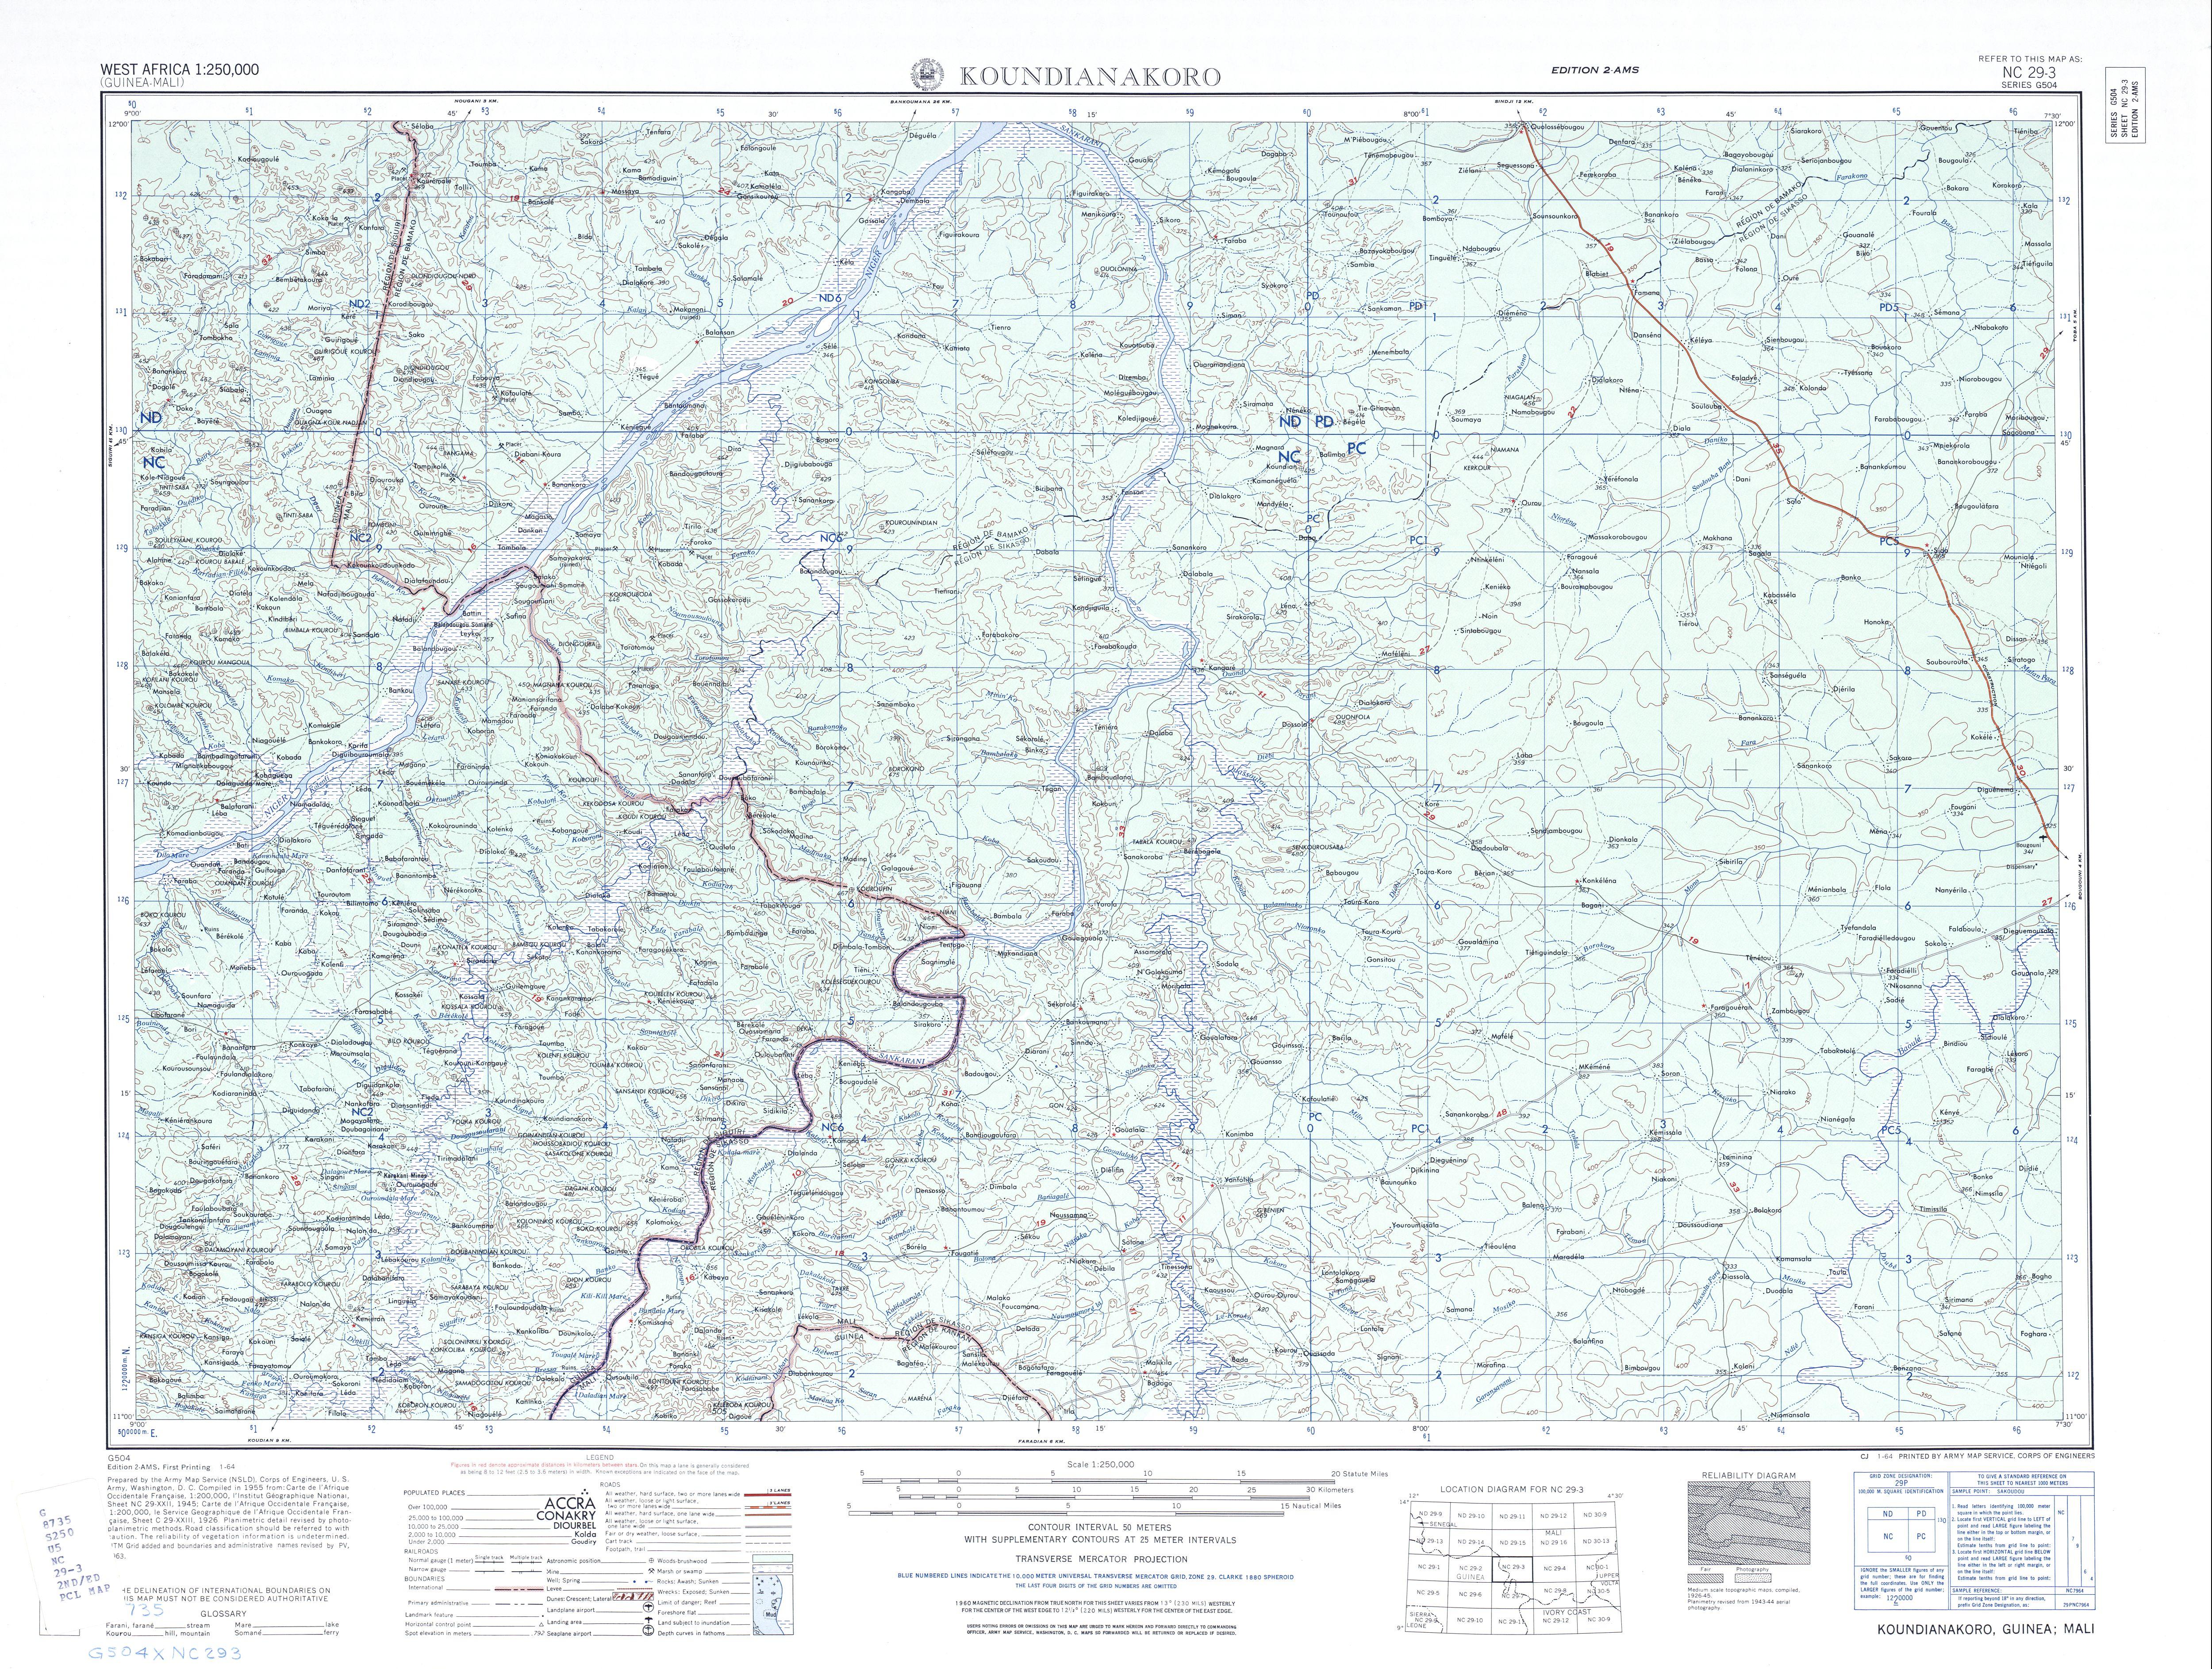 Hoja Koundianakoro del Mapa Topográfico de África Occidental 1955